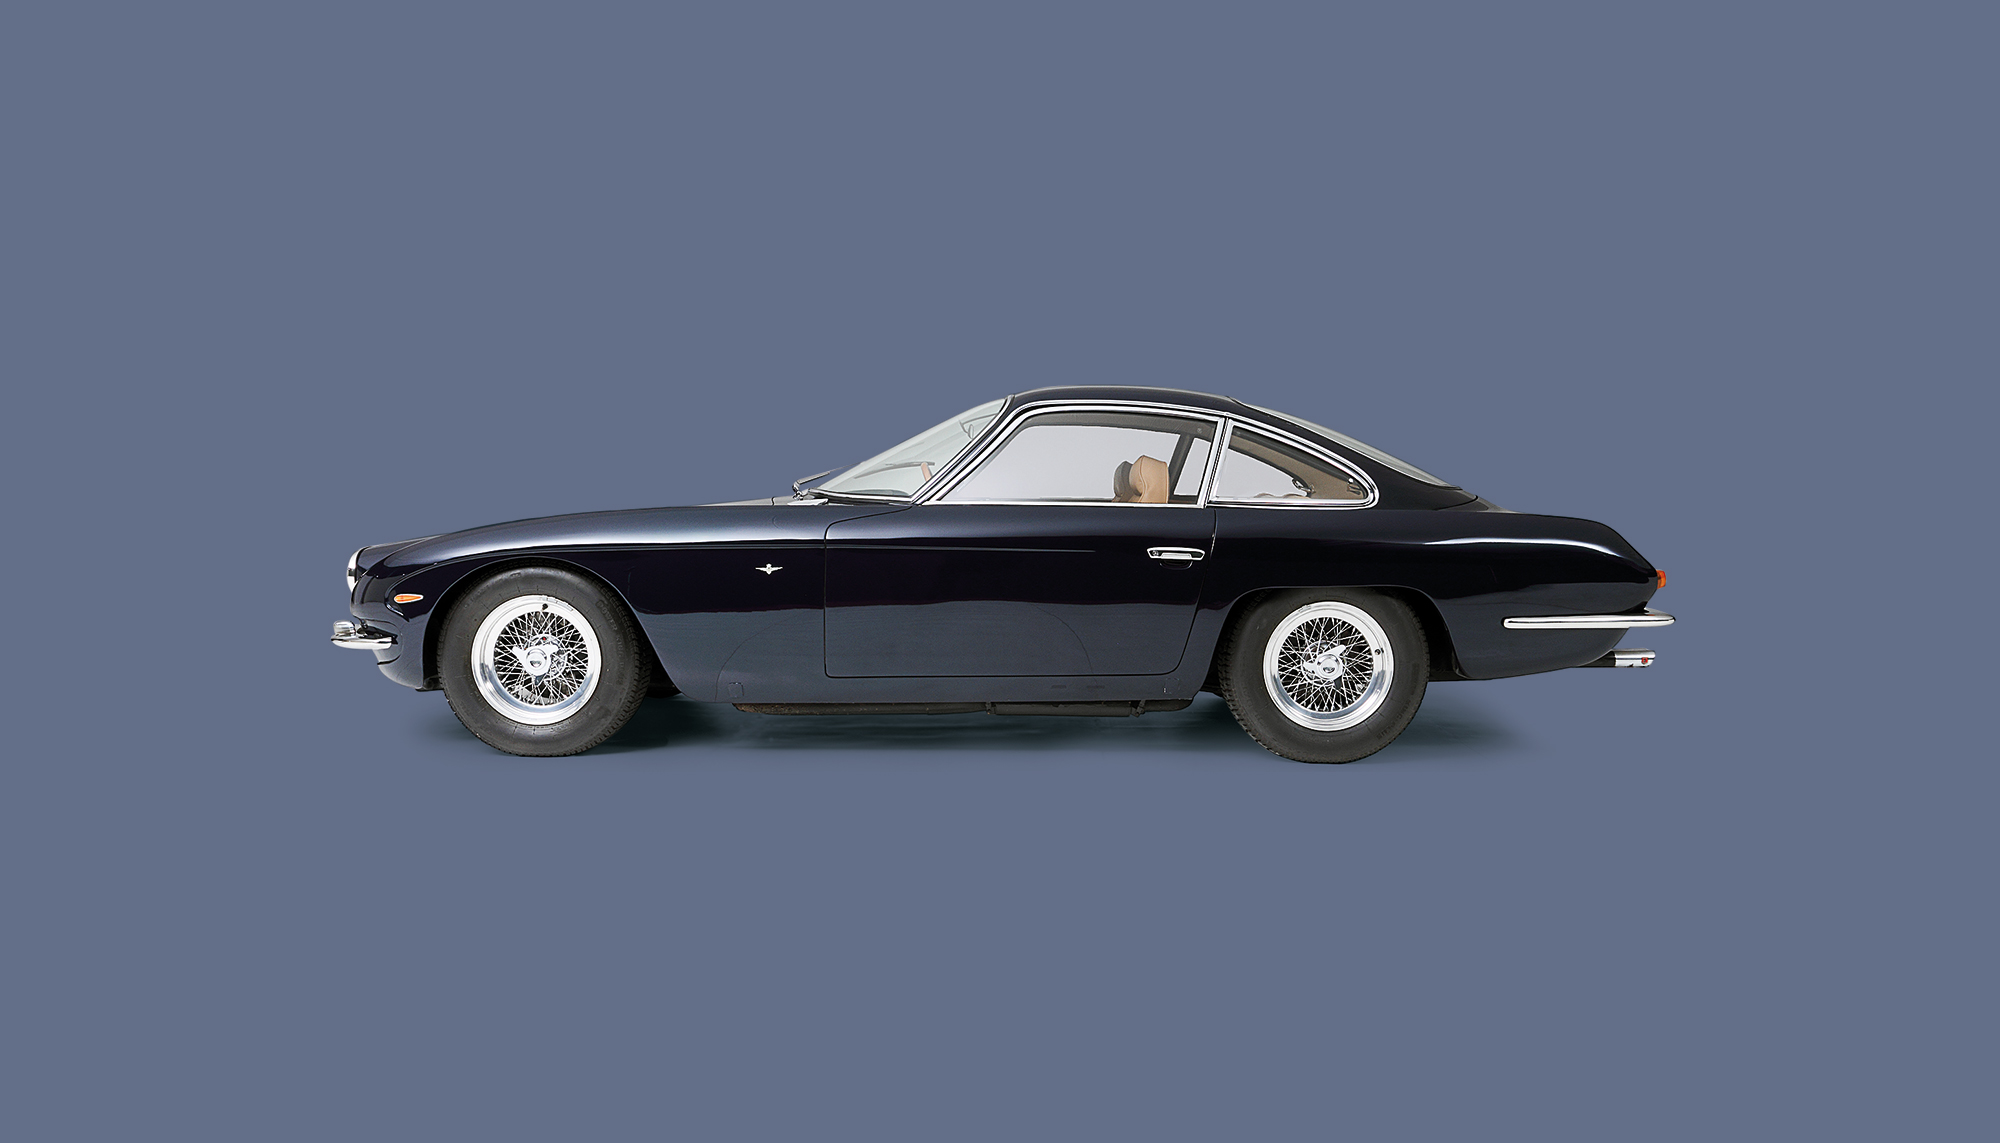 Bekijk Lamborghini 350 GT in het Louwman Museum